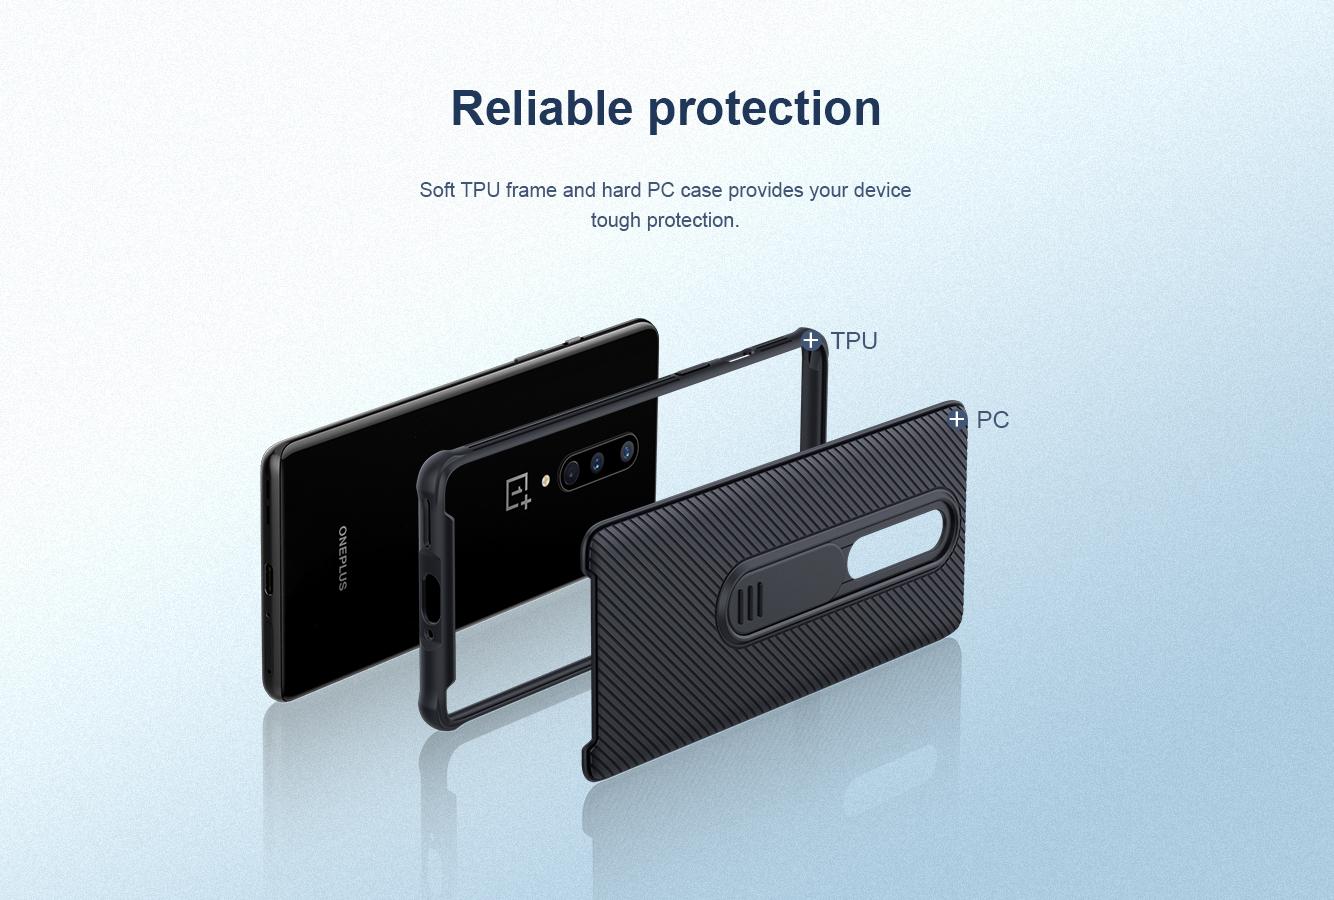 OnePlus_8_CamShield_Pro_Case-03.jpg